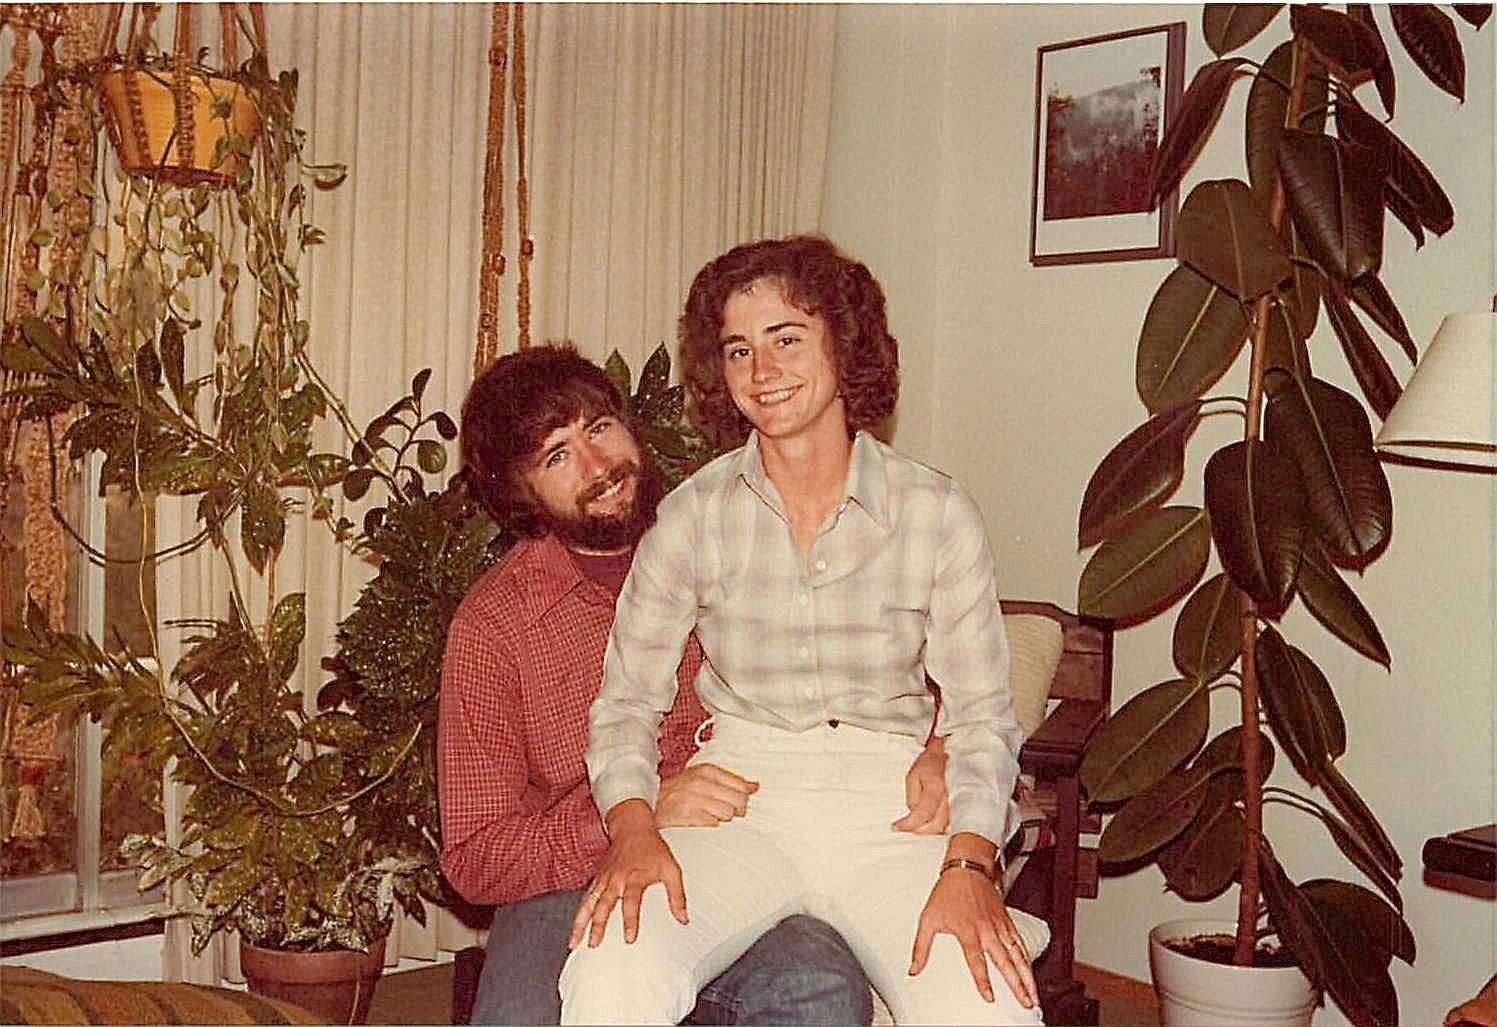 John & Ann Wagner, 1978, San Francisco, CA